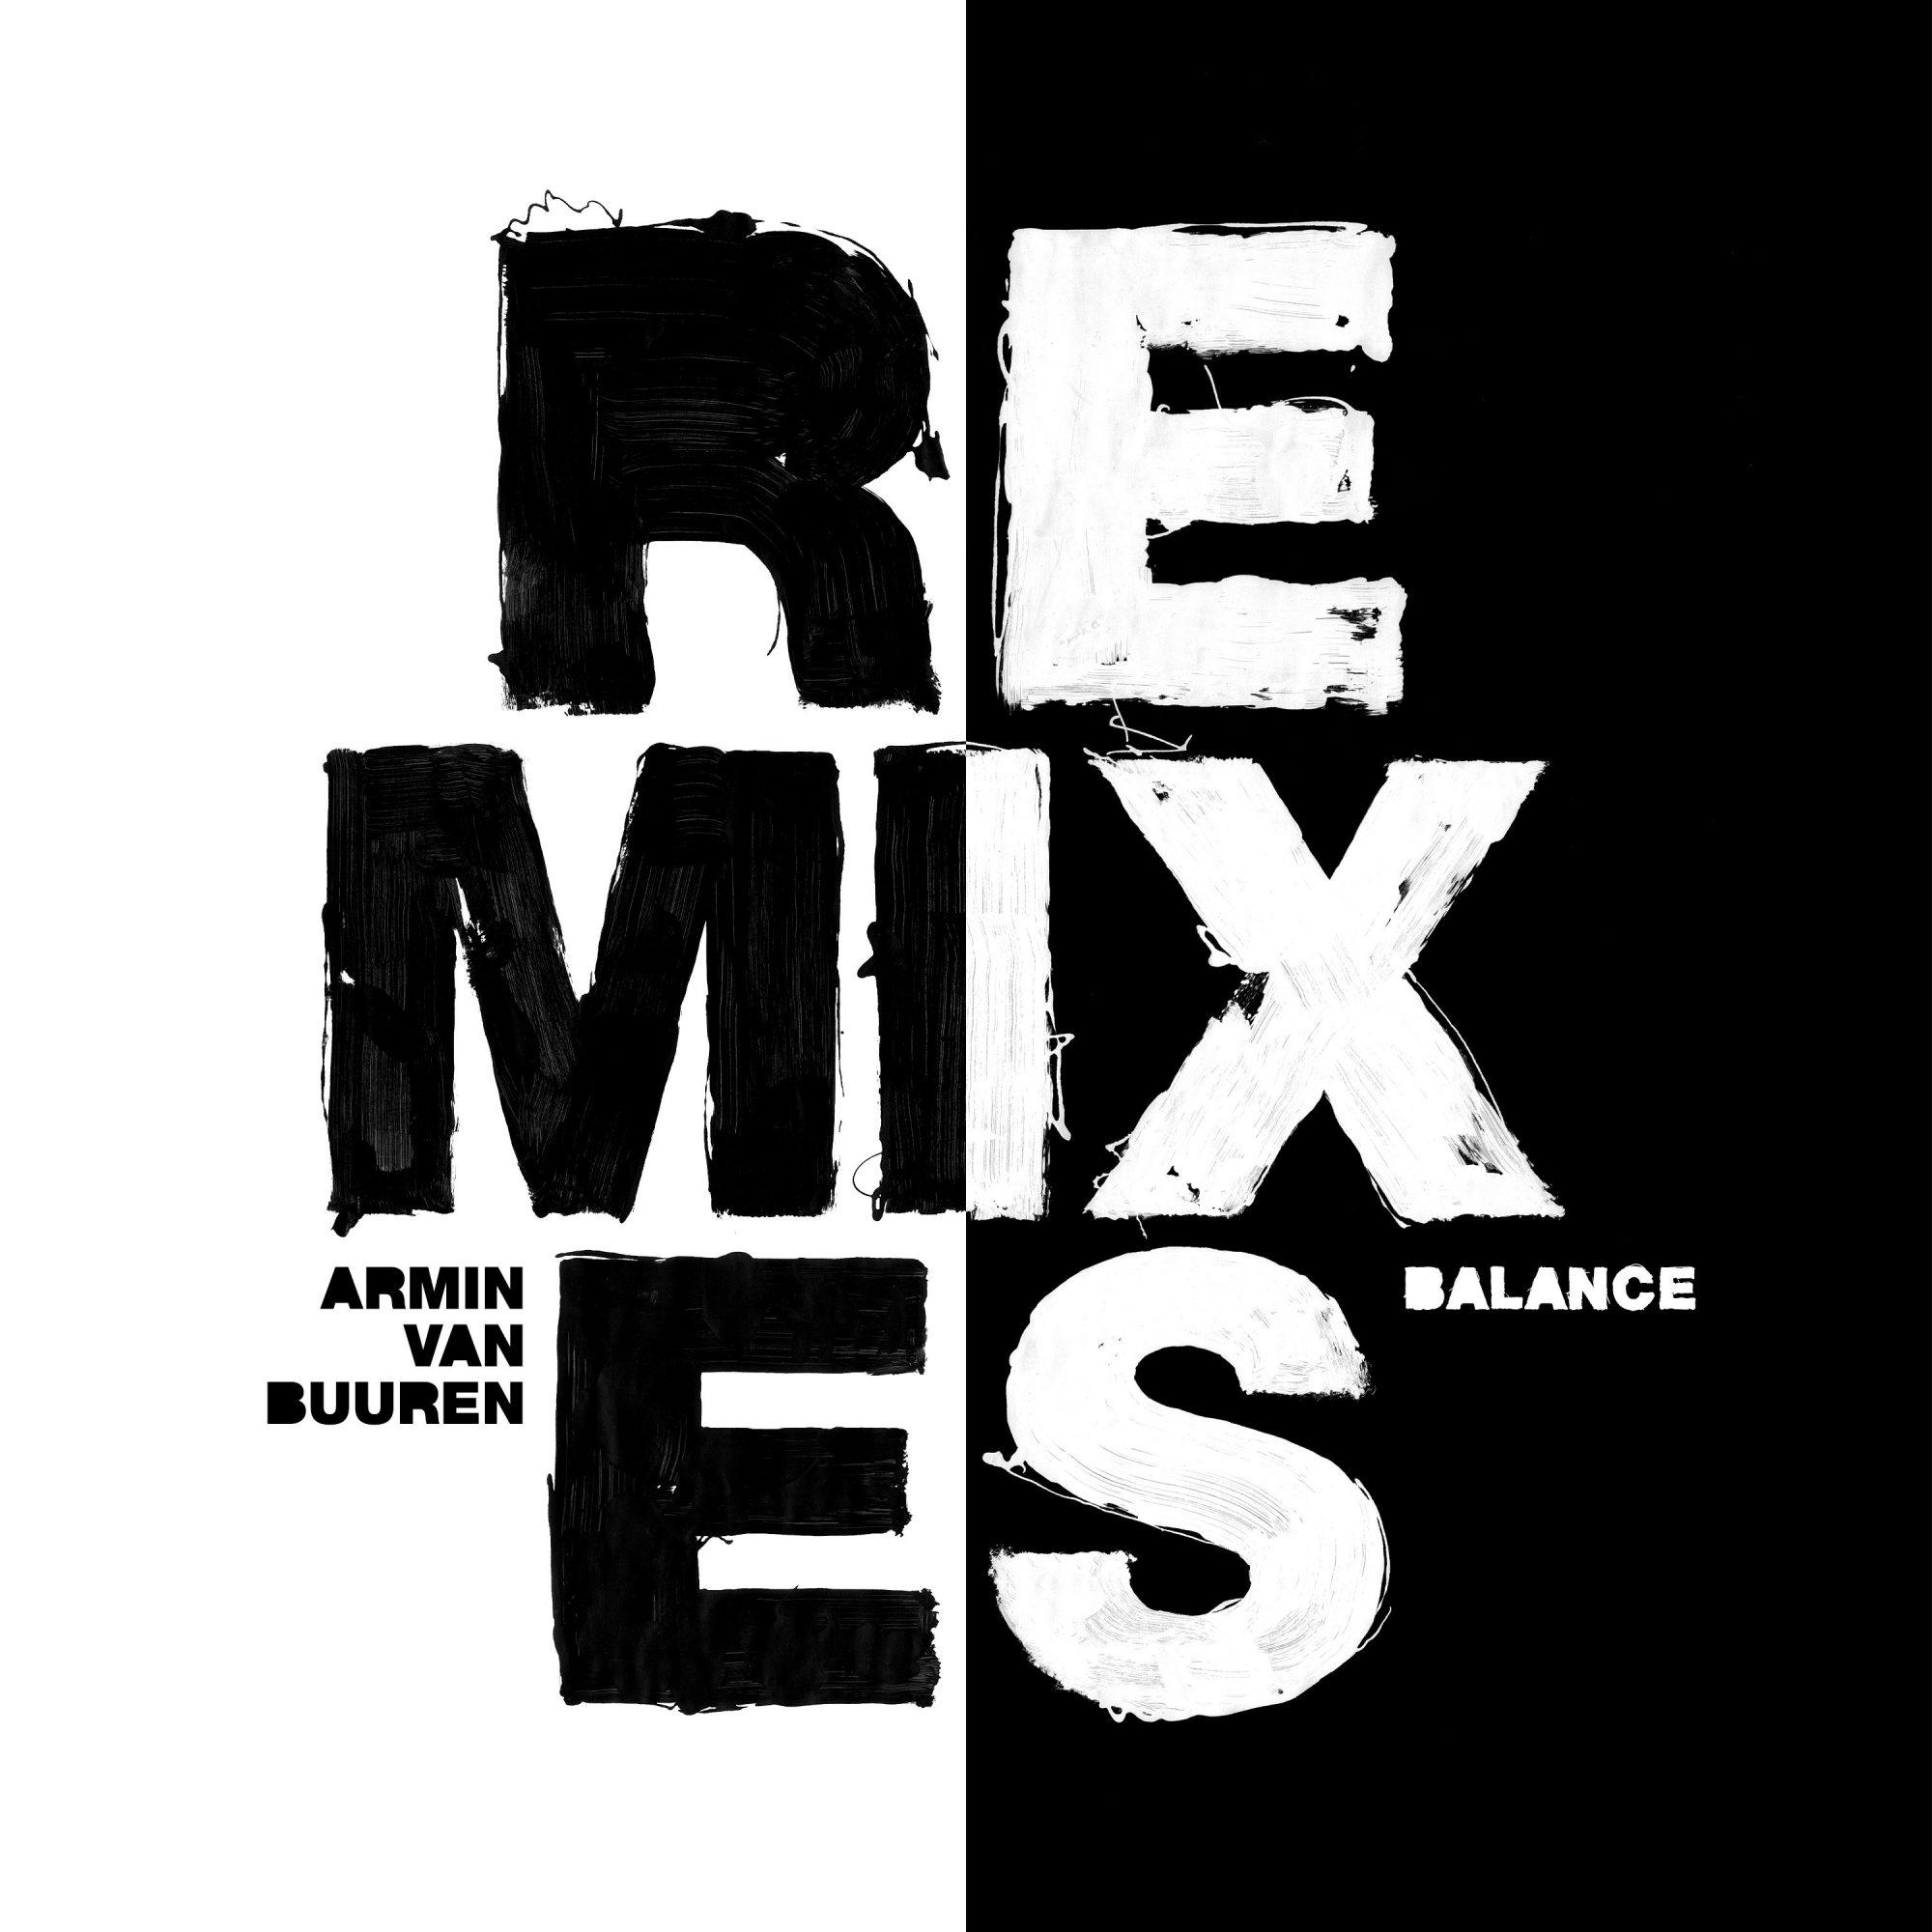 Armin van Buuren - 'Balance' Remixes